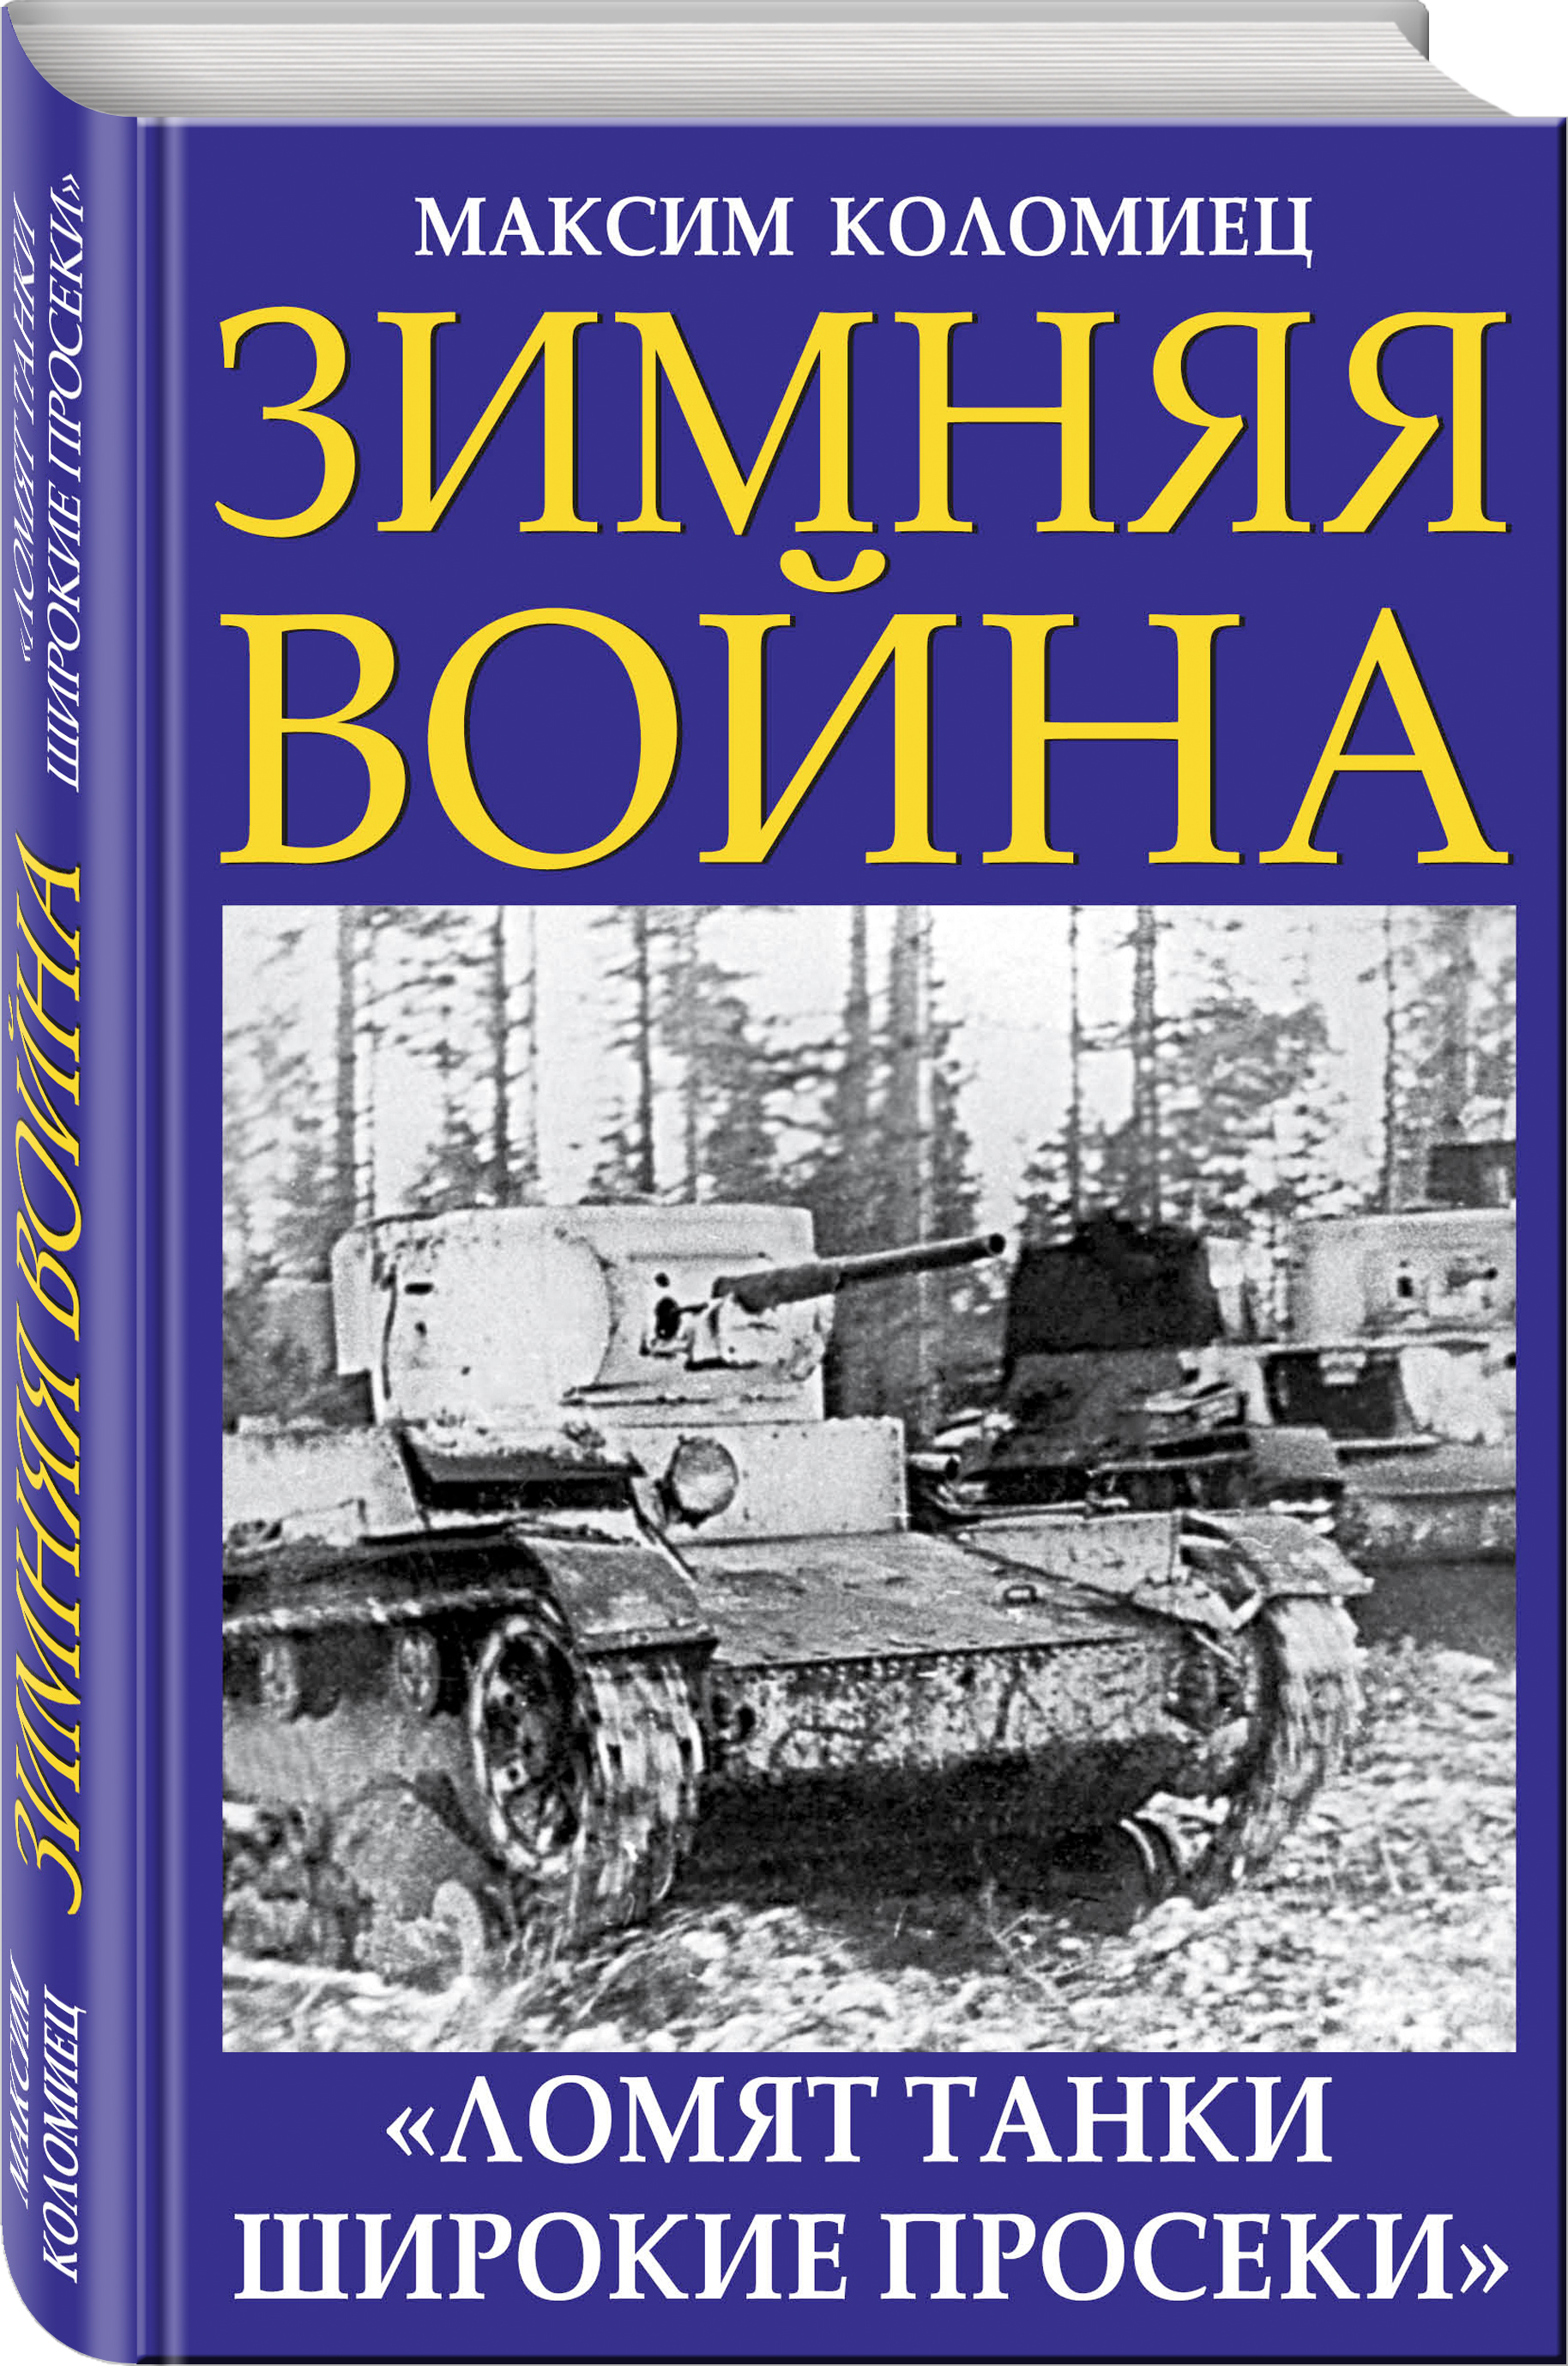 Коломиец М.В. Зимняя война. «Ломят танки широкие просеки» книги эксмо зимняя война ломят танки широкие просеки